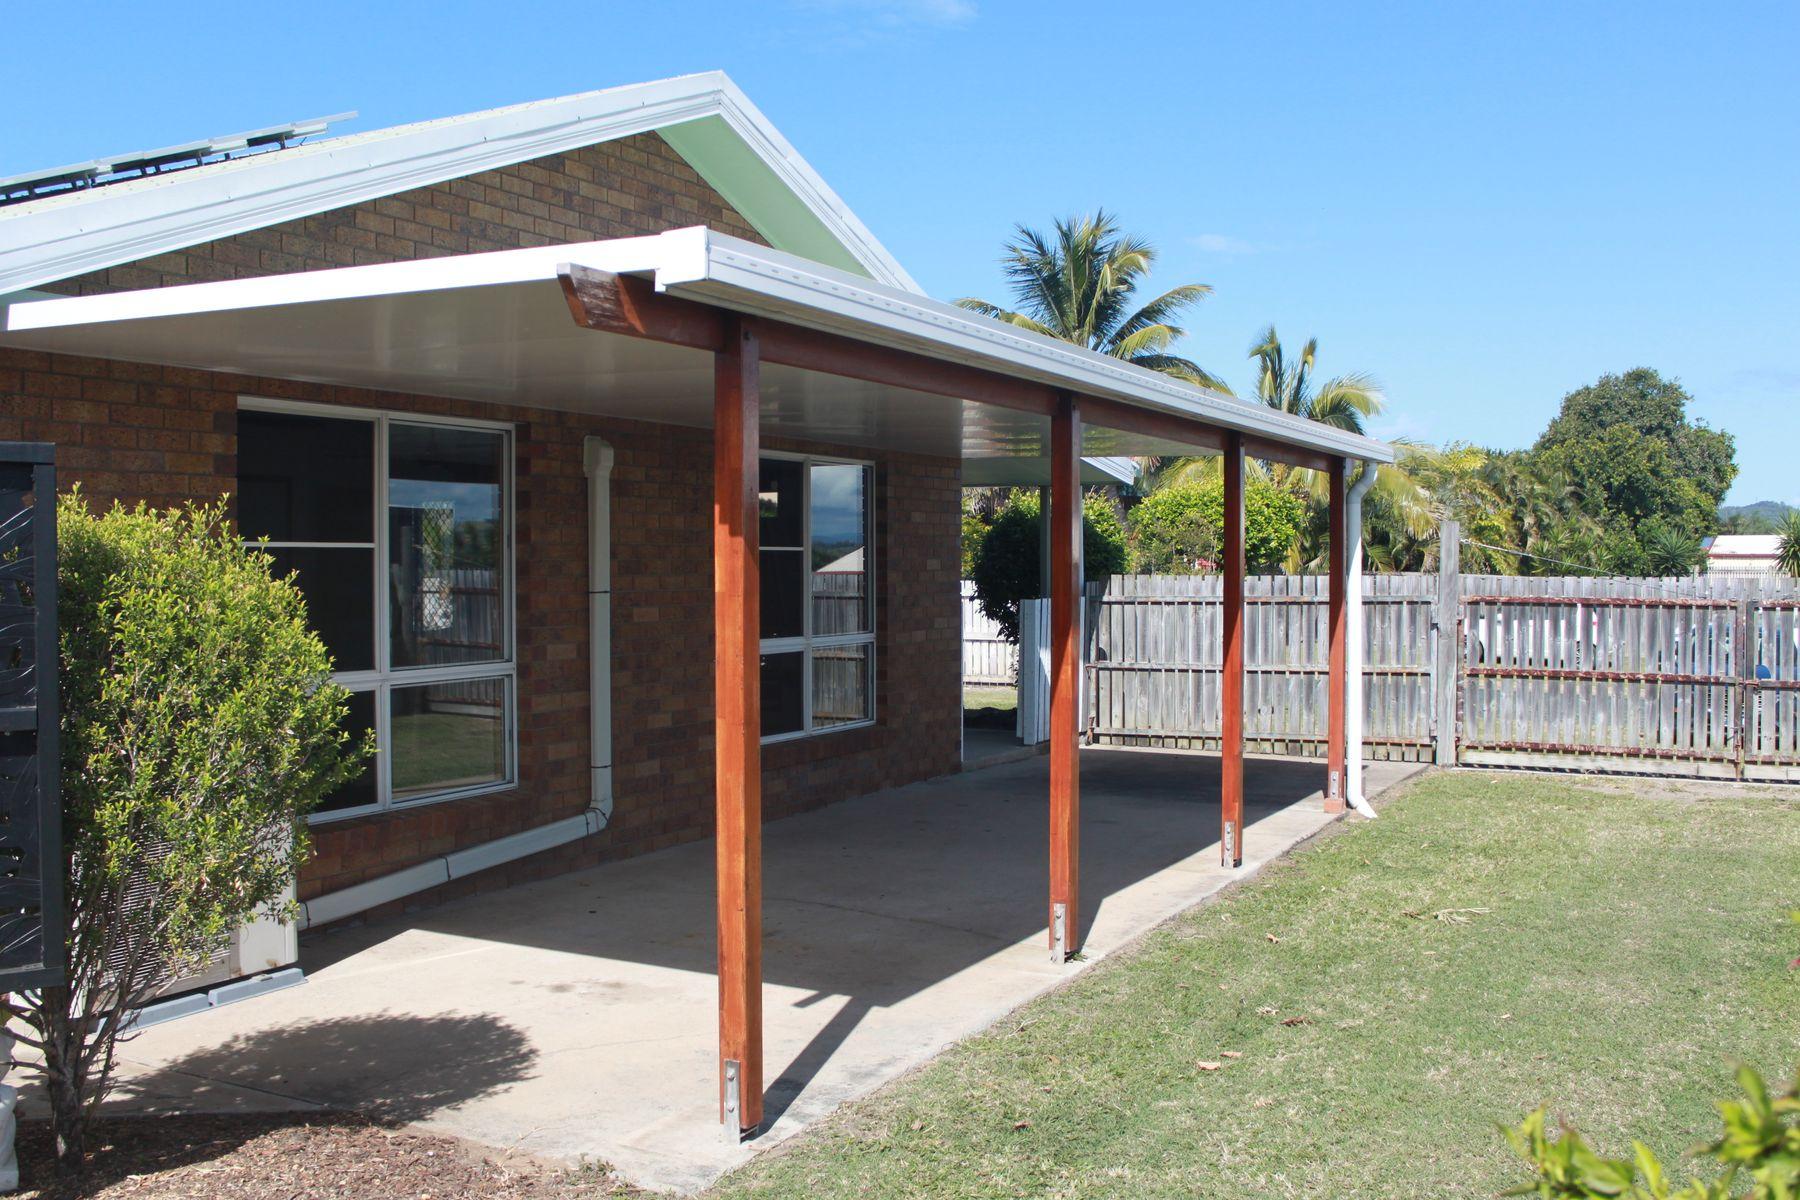 10 Gabrielle Street, Hay Point, QLD 4740